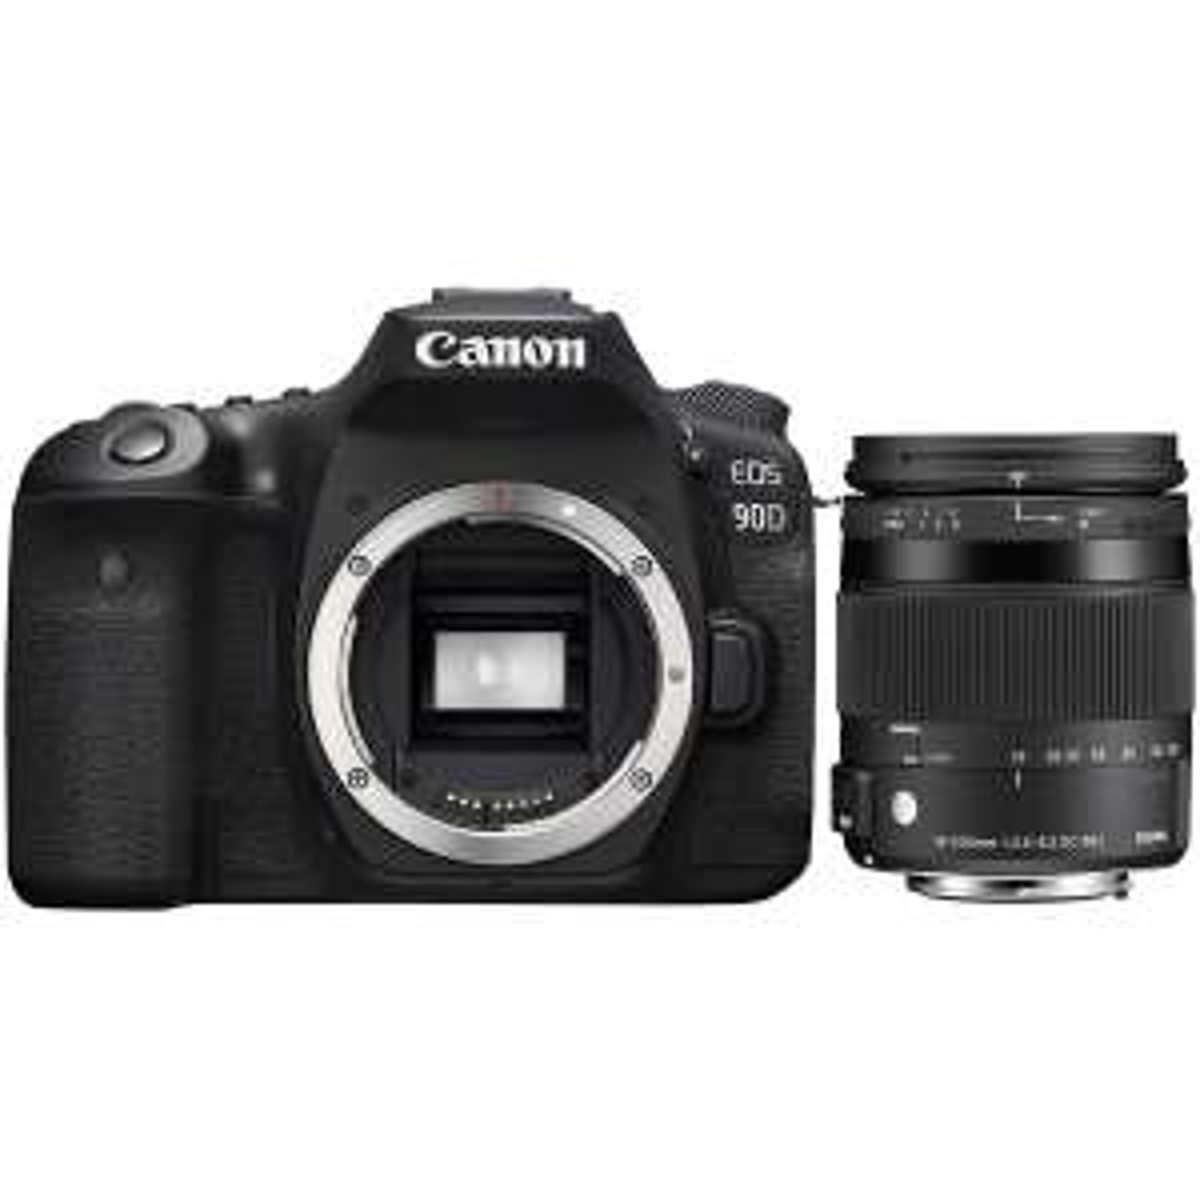 Canon 90D Spiegelreflexkamera + Sigma 18-200mm F3,5-6,3 DC Makro OS HSM Objektiv